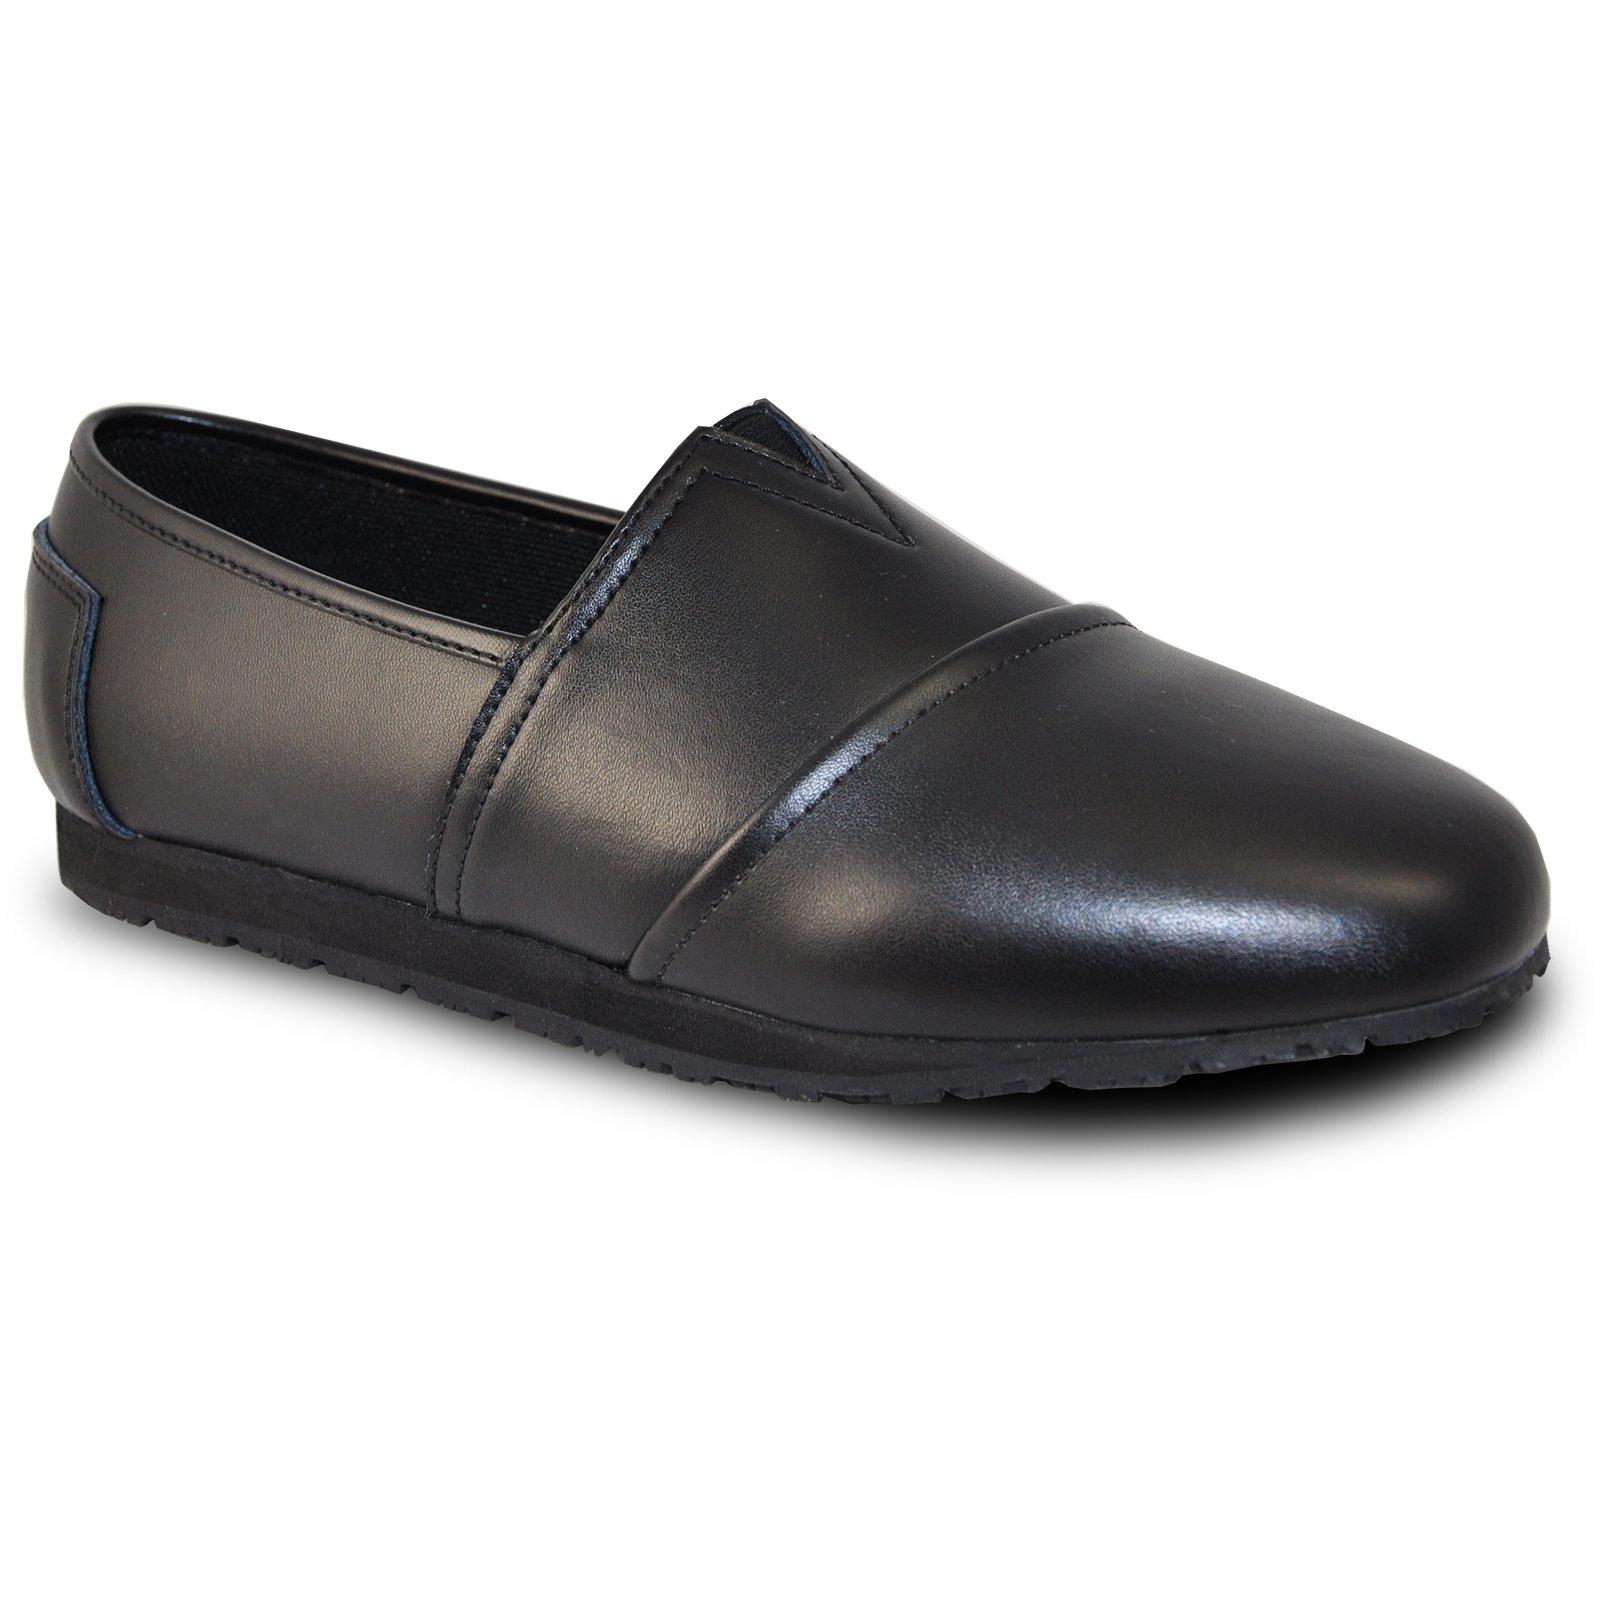 VANGELO Professional Slip Resistant Women Work Shoe Isana Black by VANGELO (Image #8)